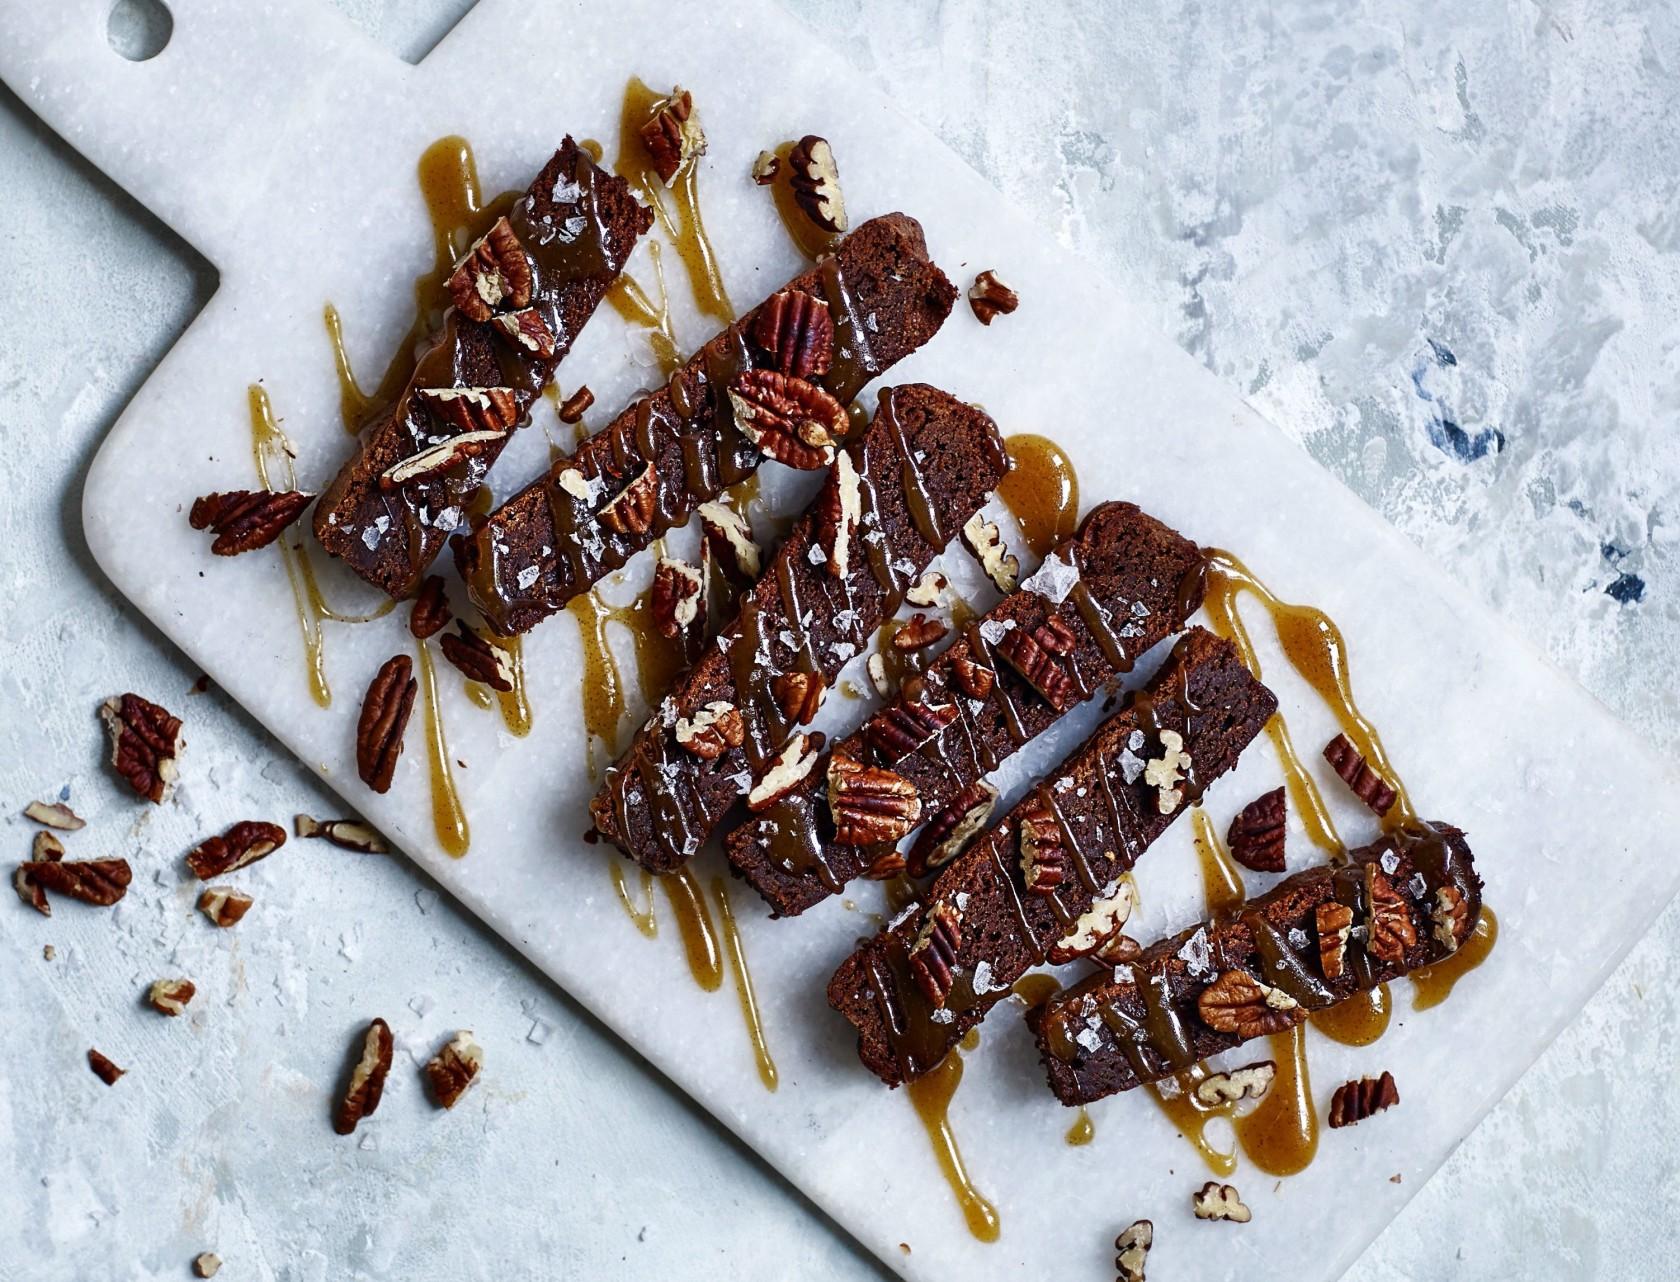 Den lækreste brownie med pekannødder og saltkaramel